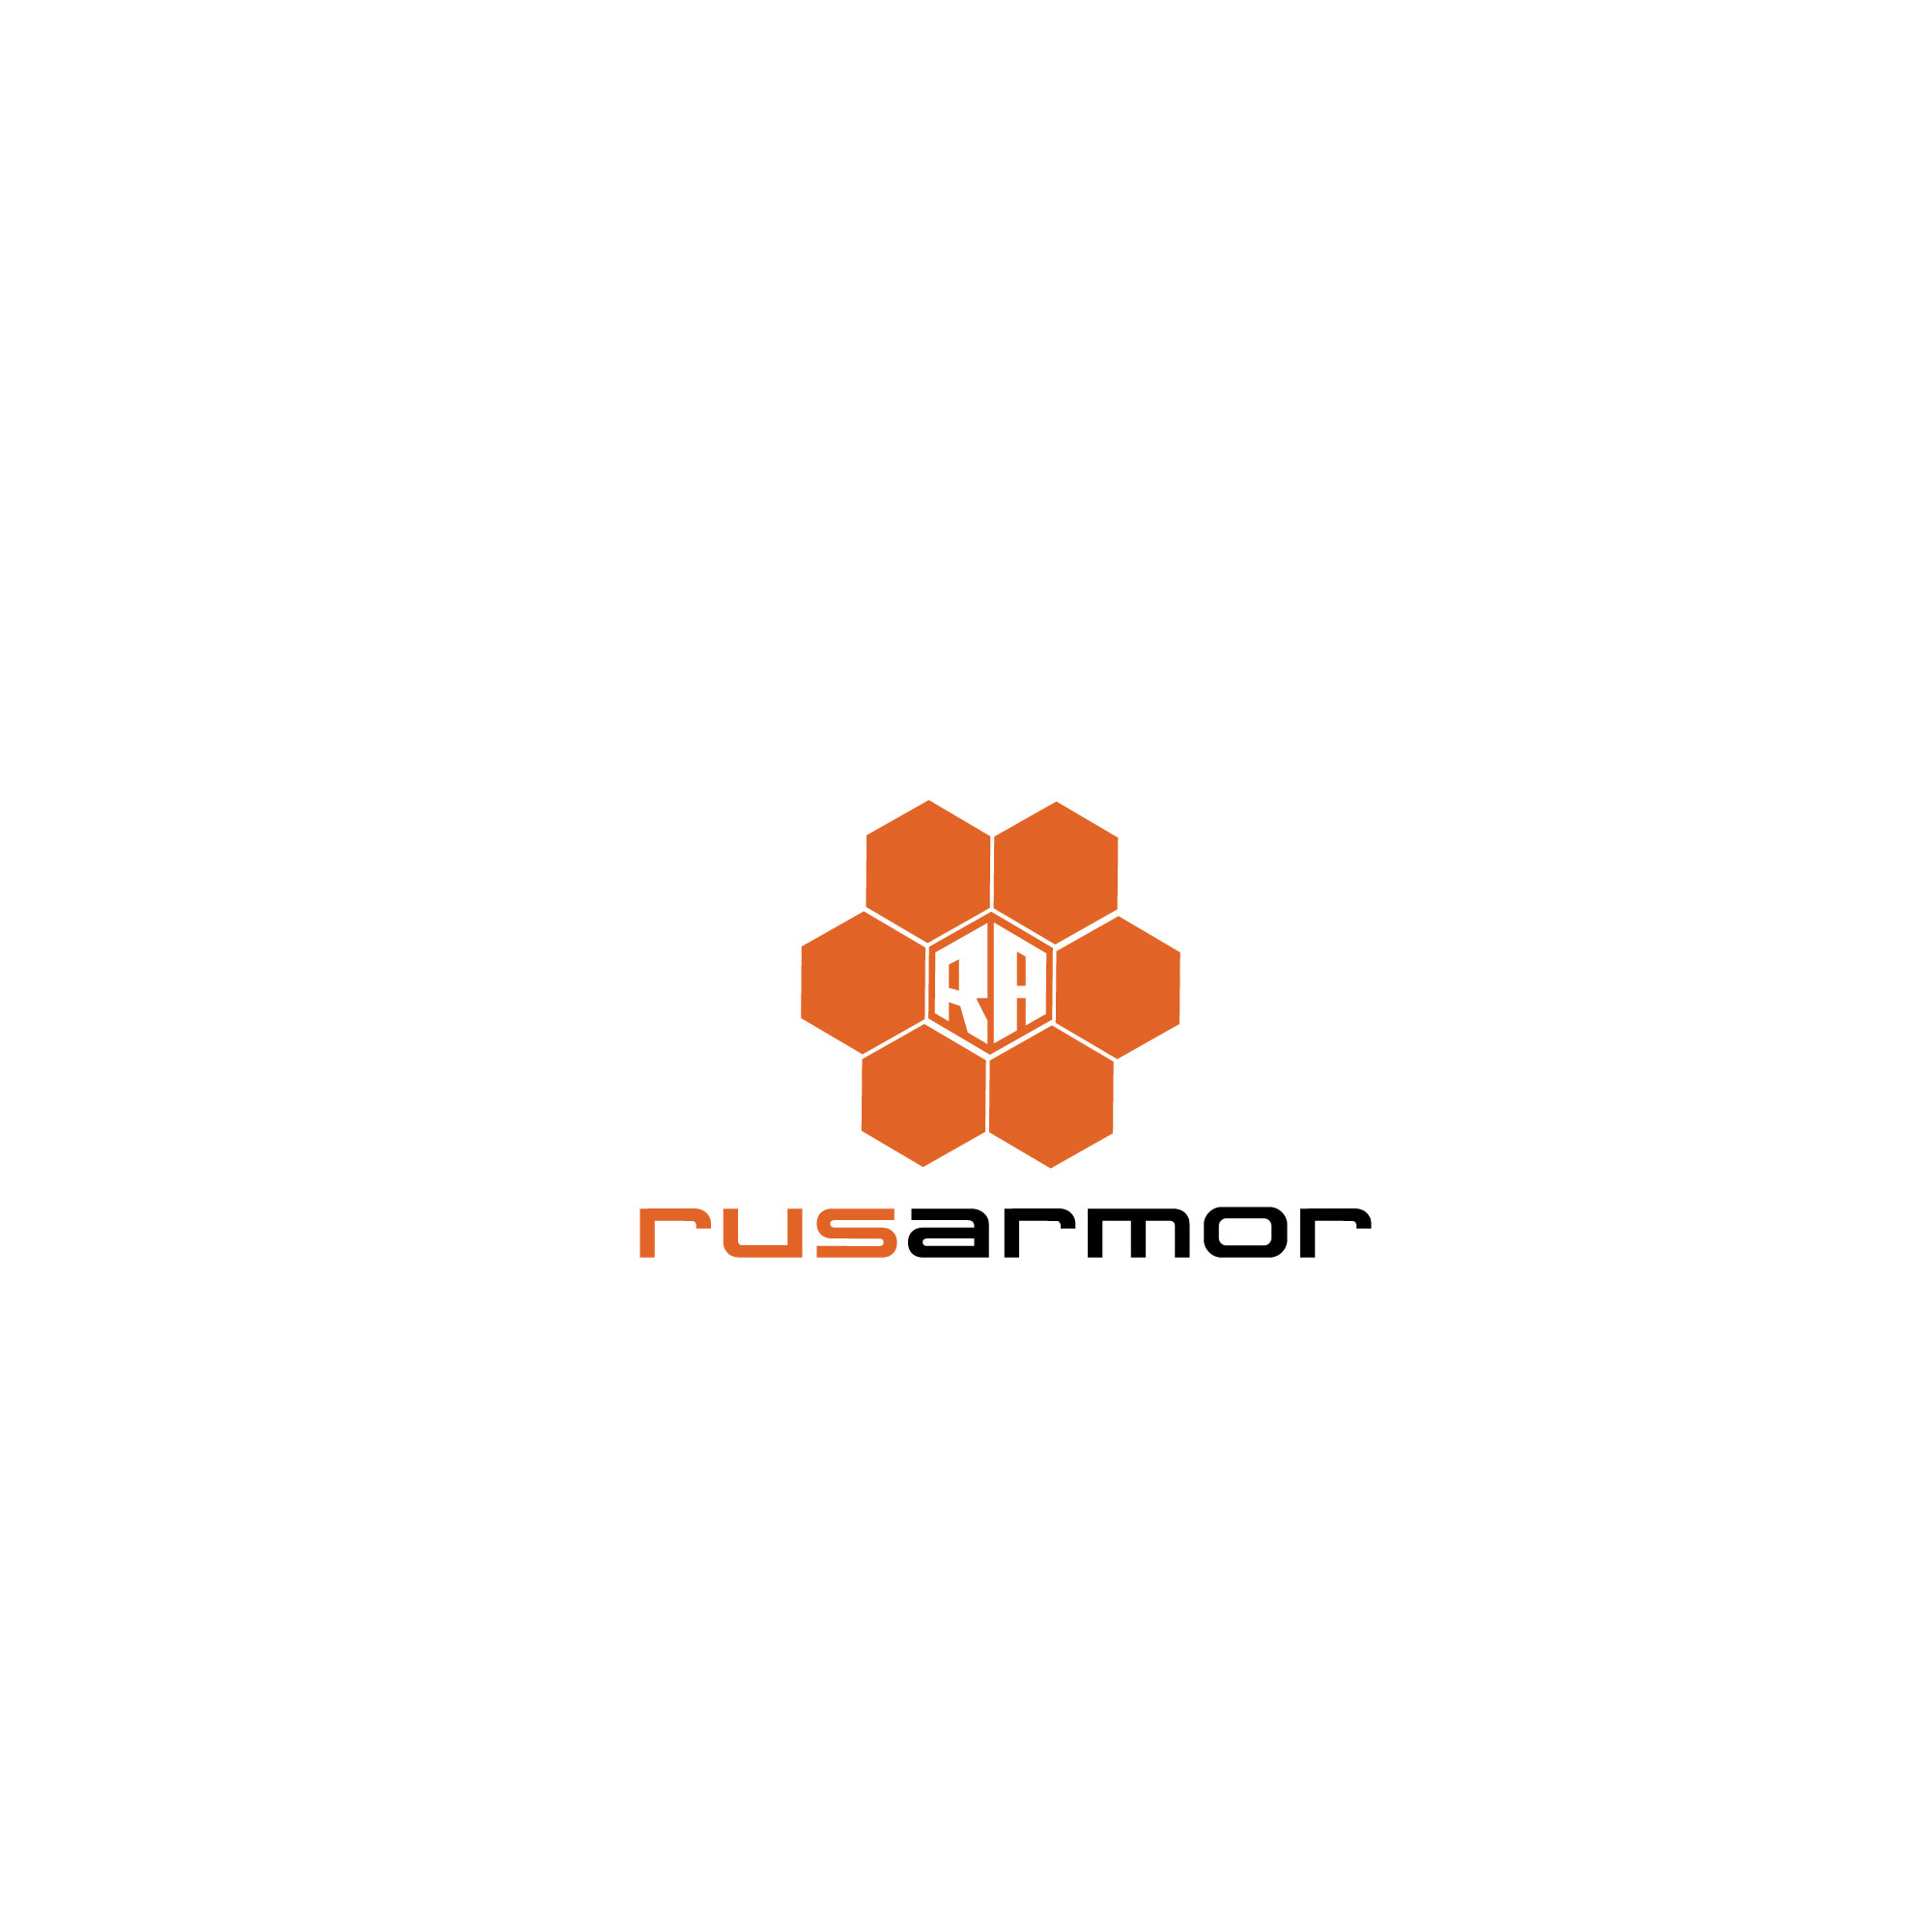 Разработка логотипа технологического стартапа РУСАРМОР фото f_4755a0aede7a5a7b.jpg